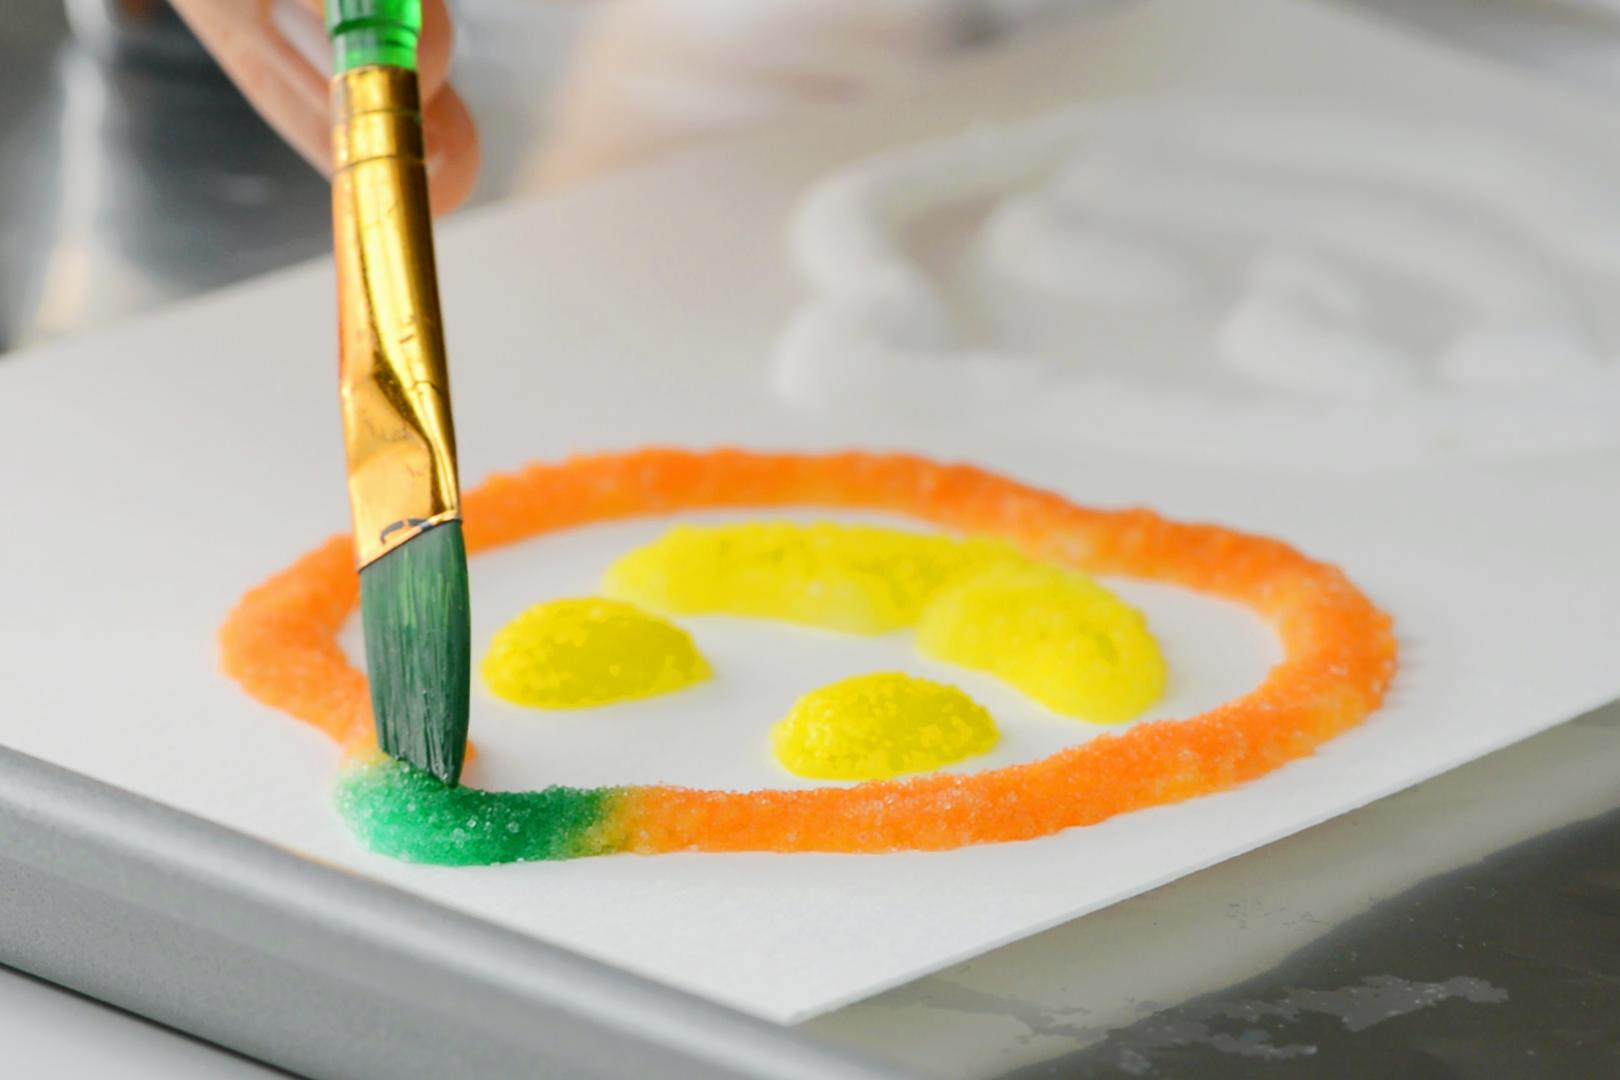 Salt Painted Halloween Craft | Easy Salt Painted Pumpkins And Spiderweb - Crafts